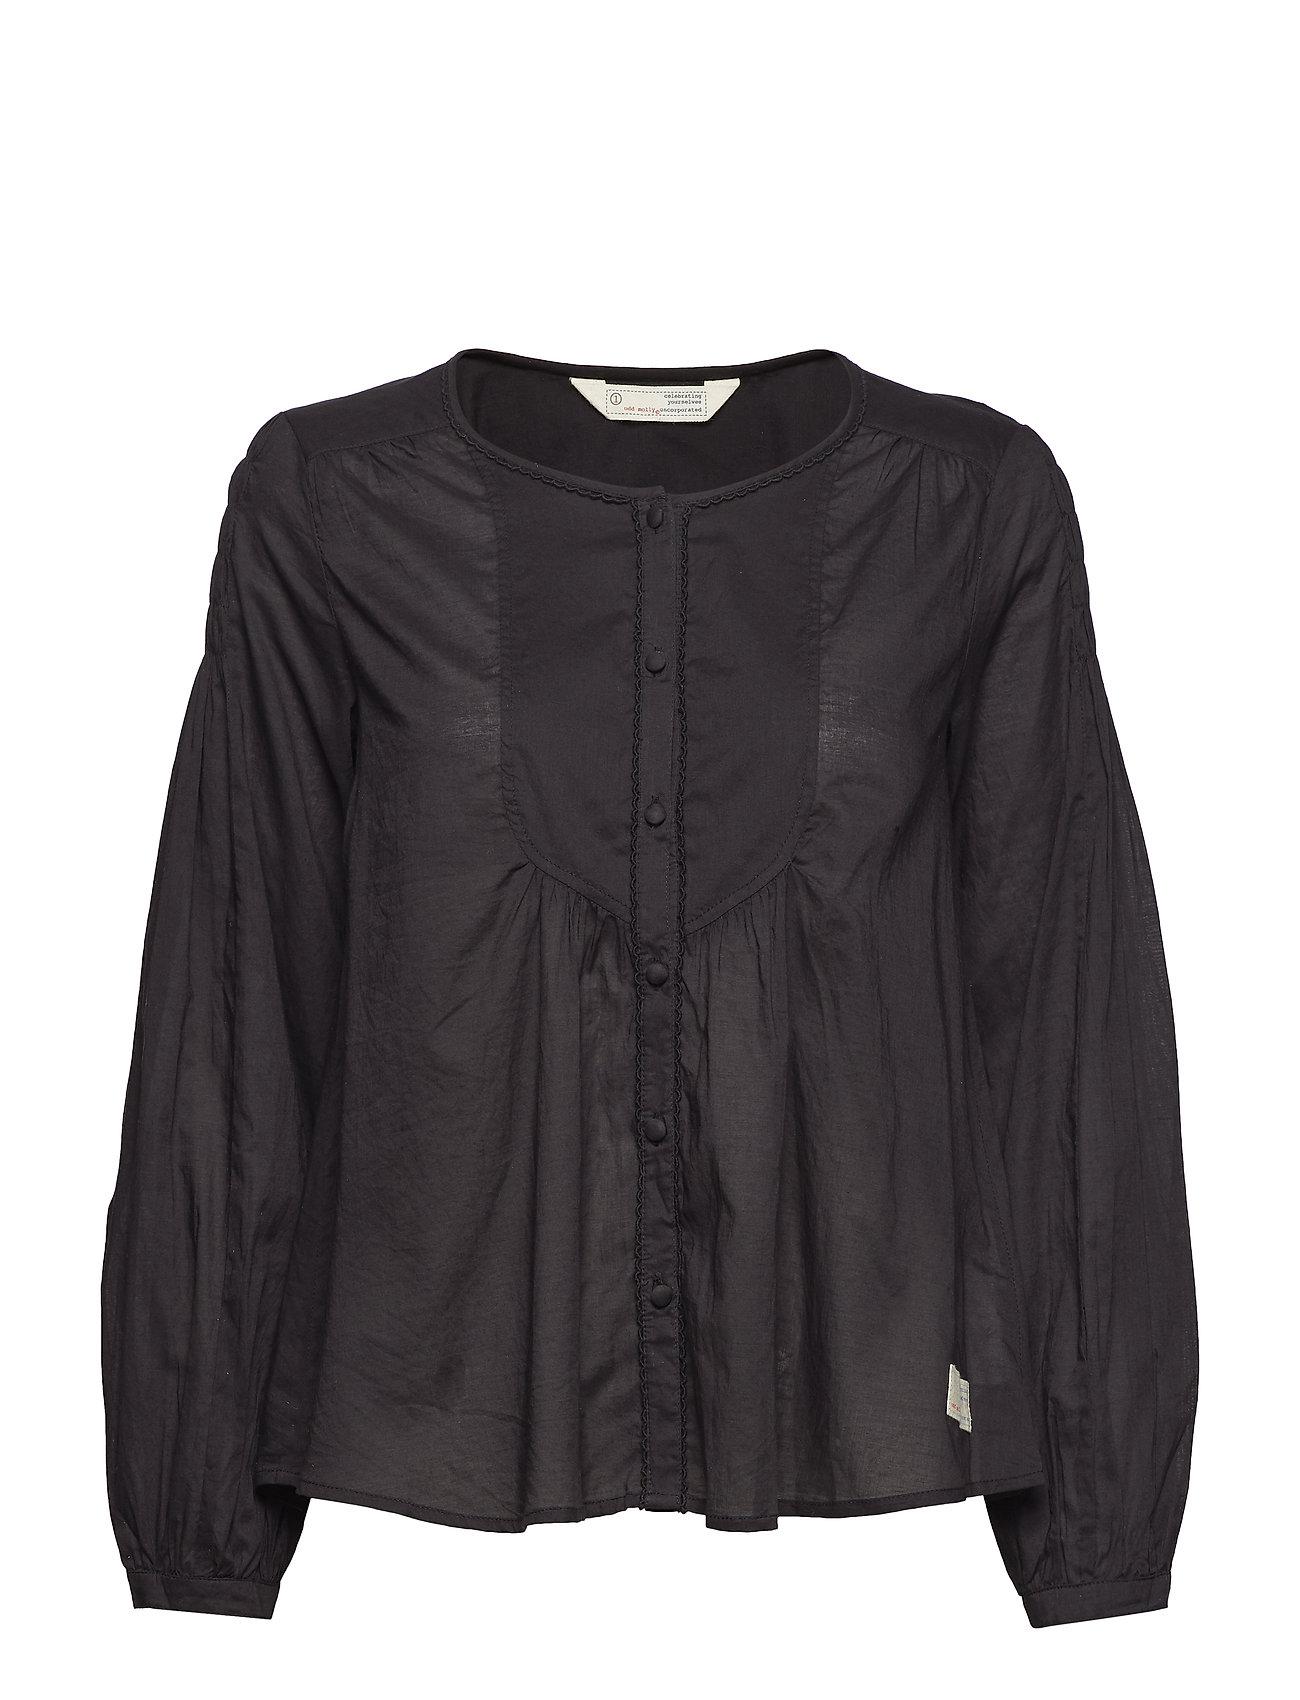 ODD MOLLY magic space blouse - ALMOST BLACK